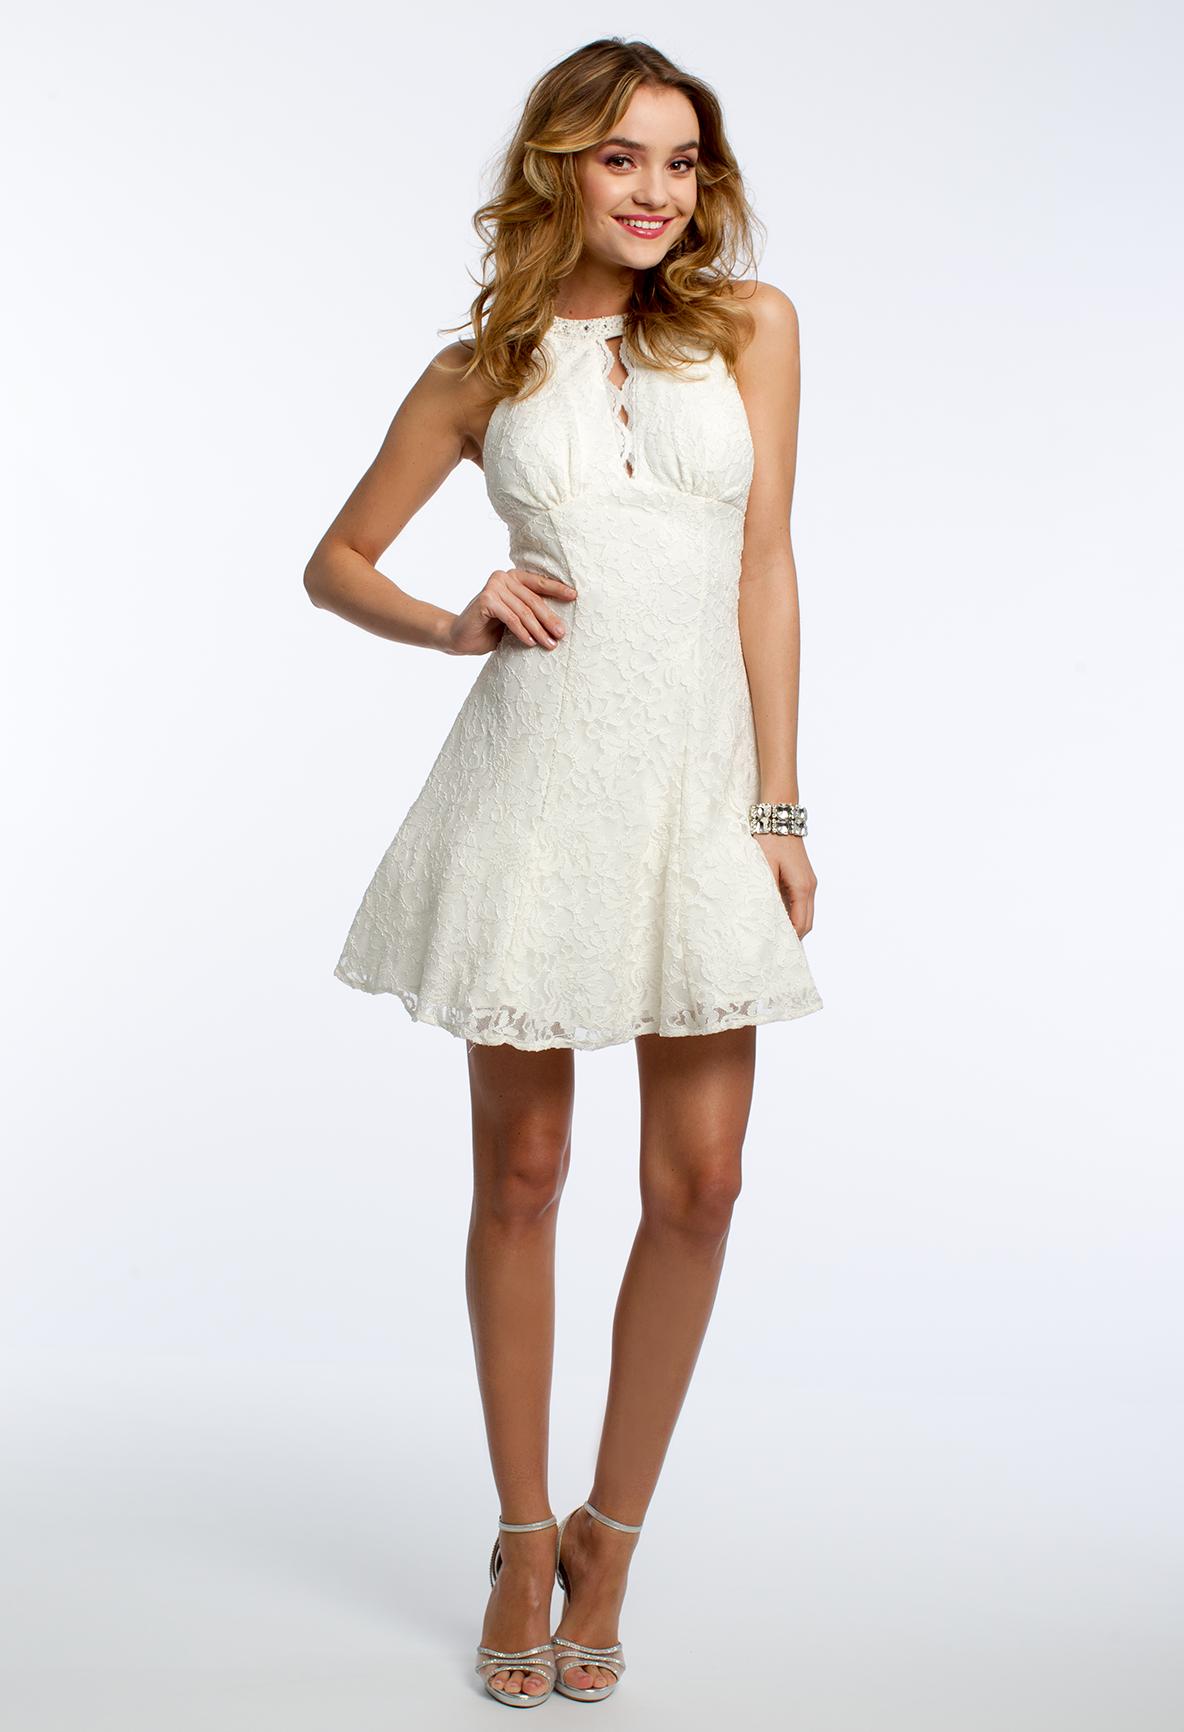 Glitter party lace dress camillelavie lace love pinterest